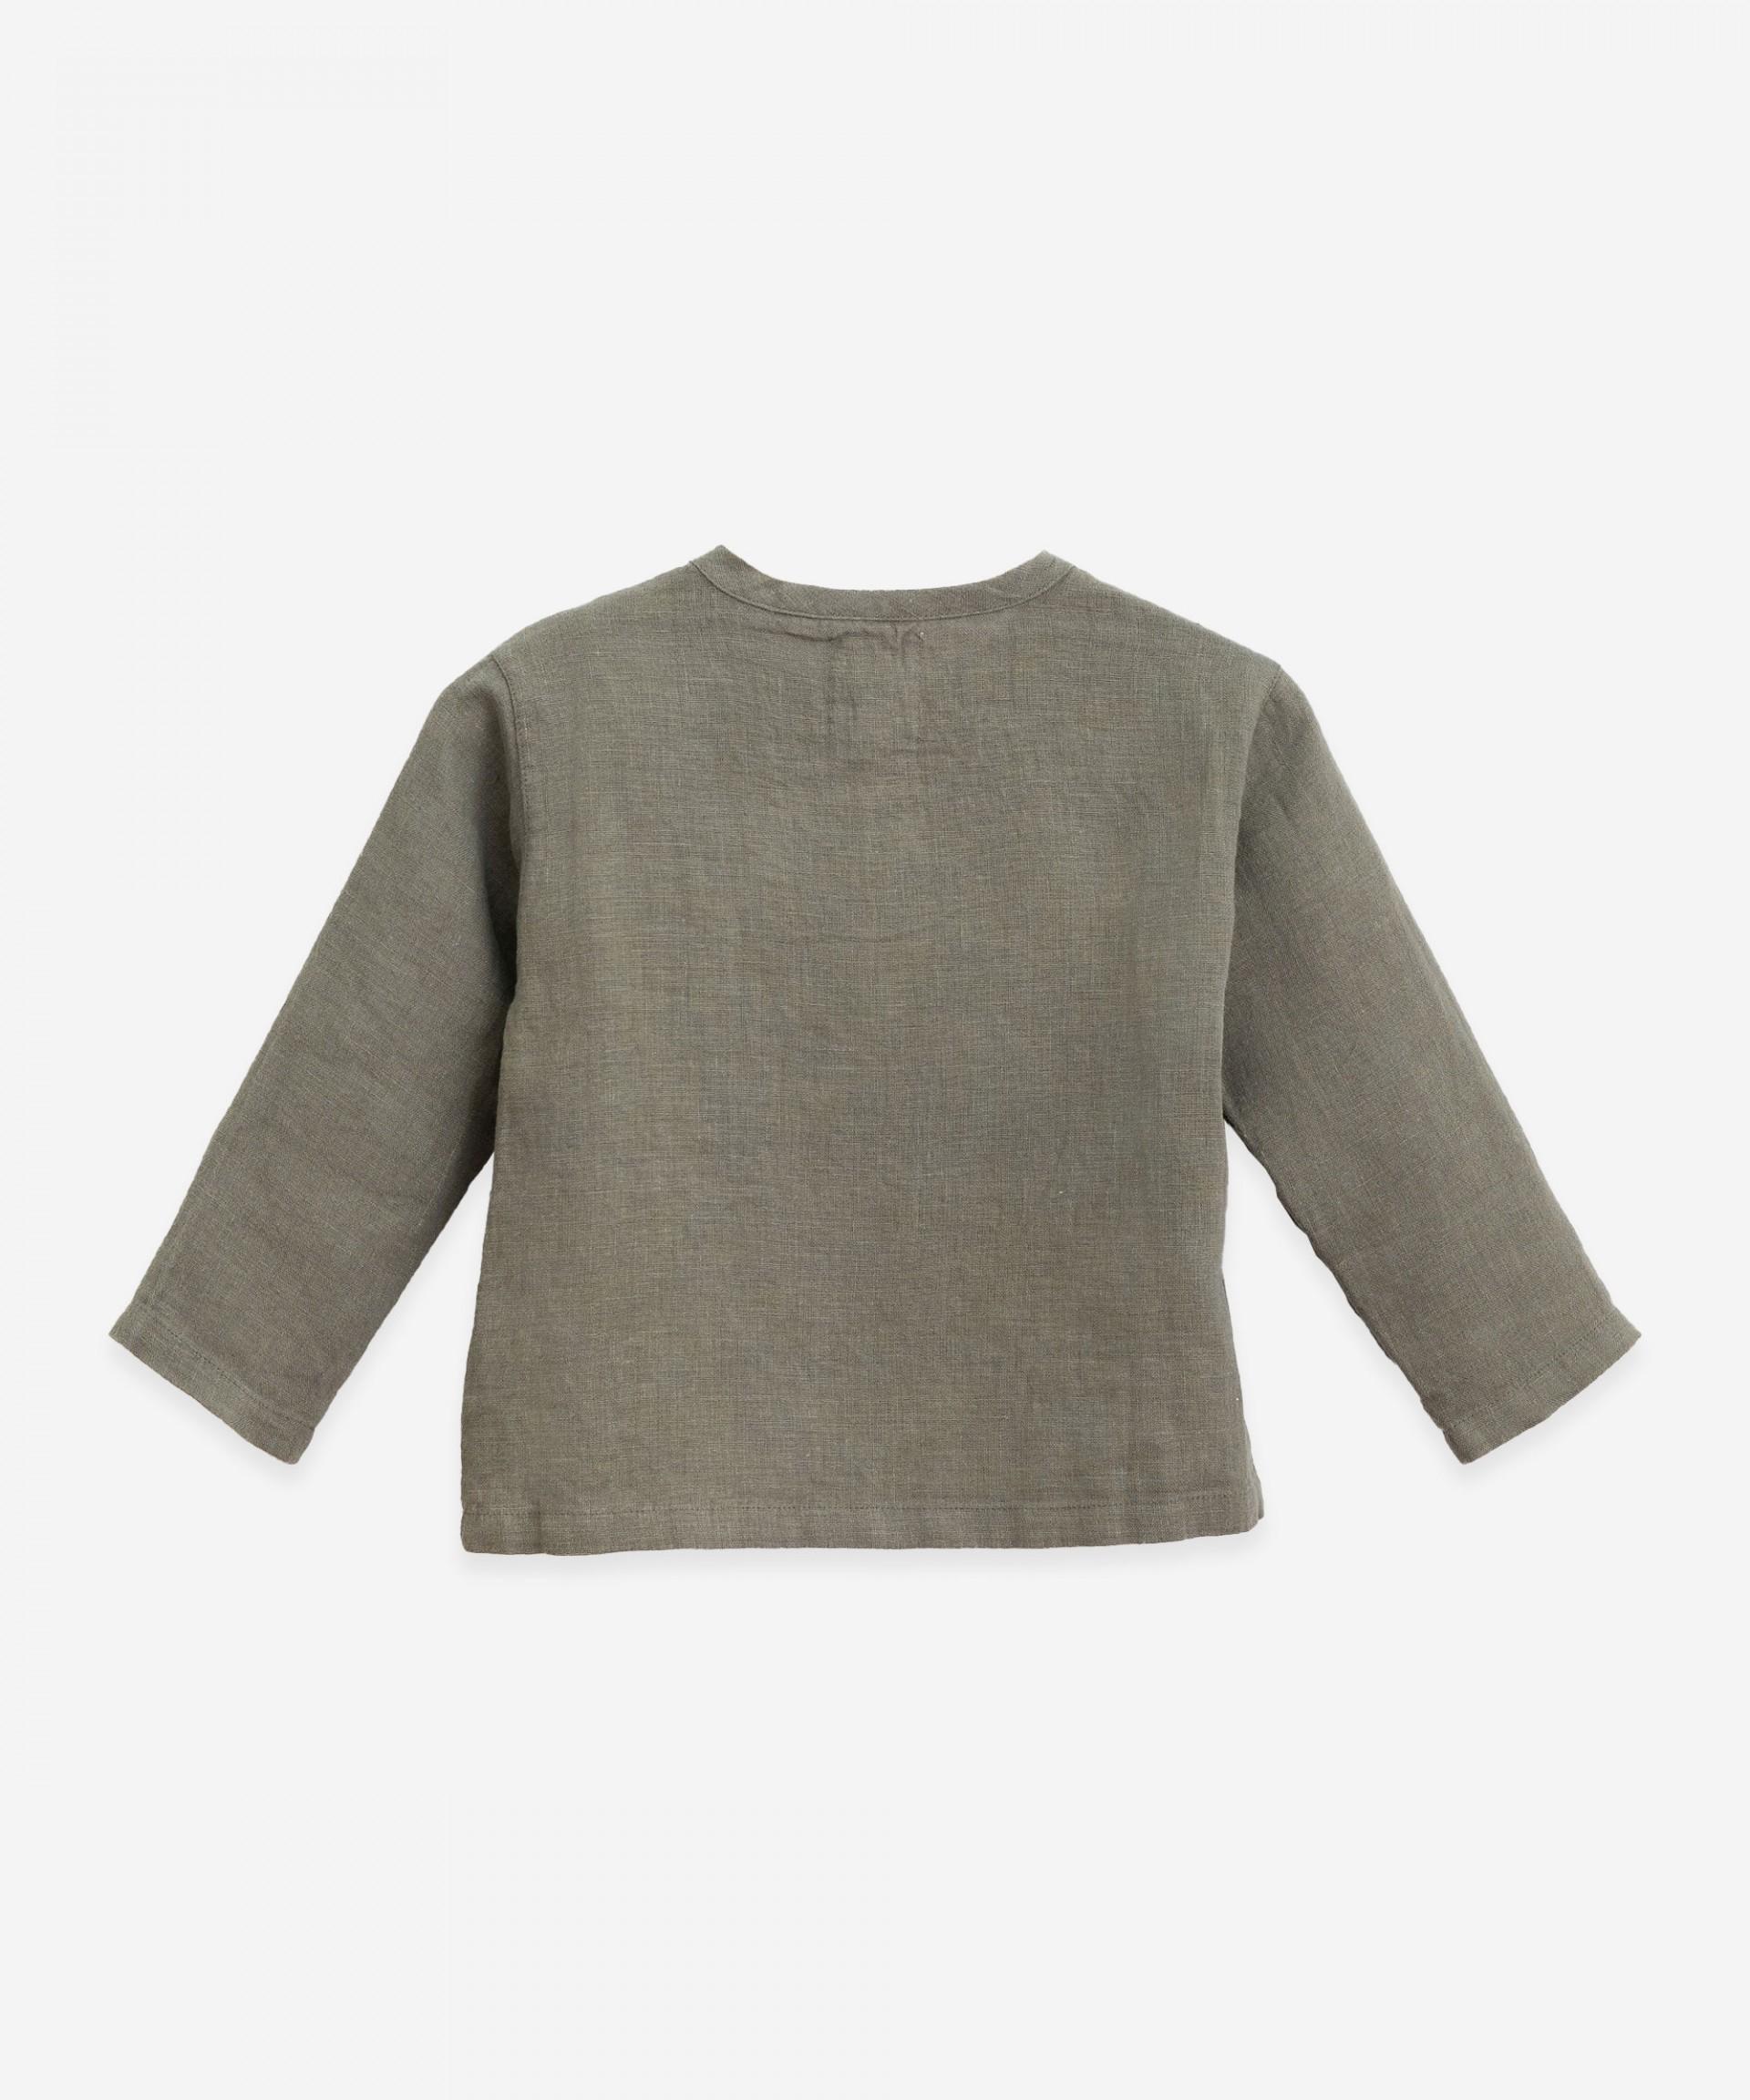 Camisa de lino con bolsillo | Botany